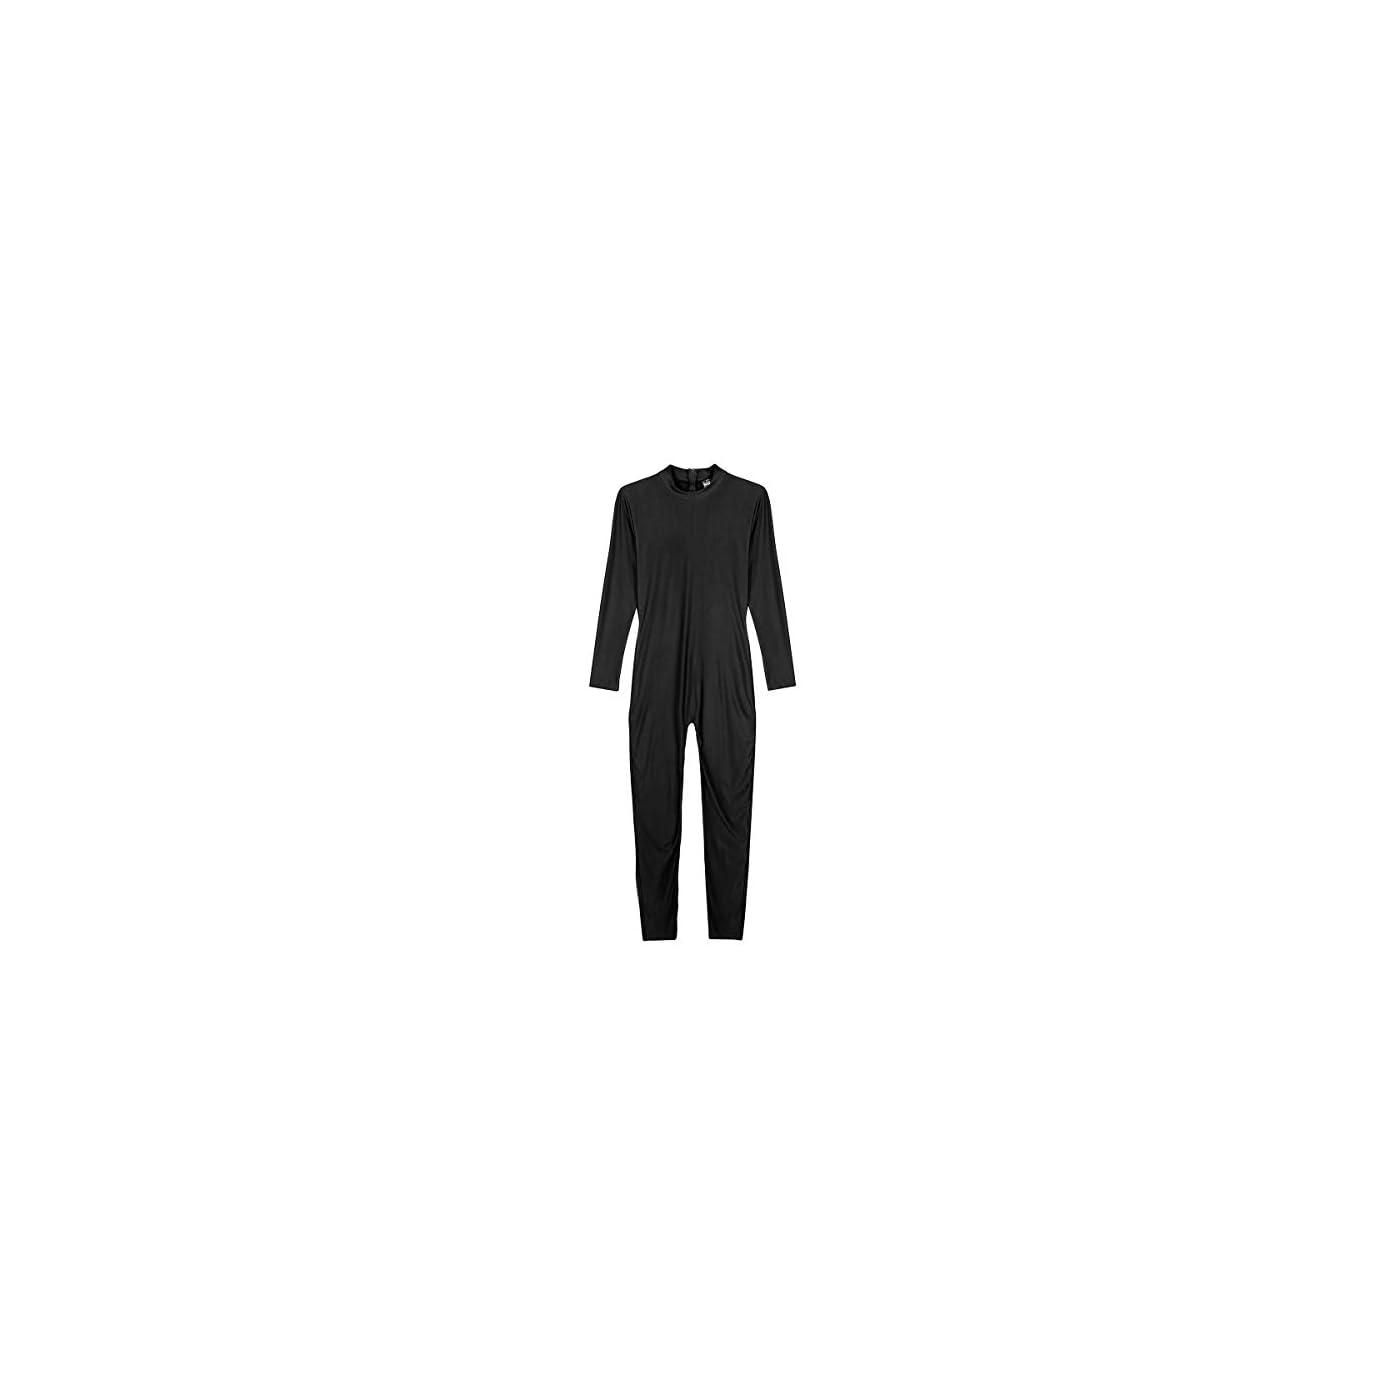 FEESHOW Men's High Neck Zip One Piece Leotard Bodysuit ...